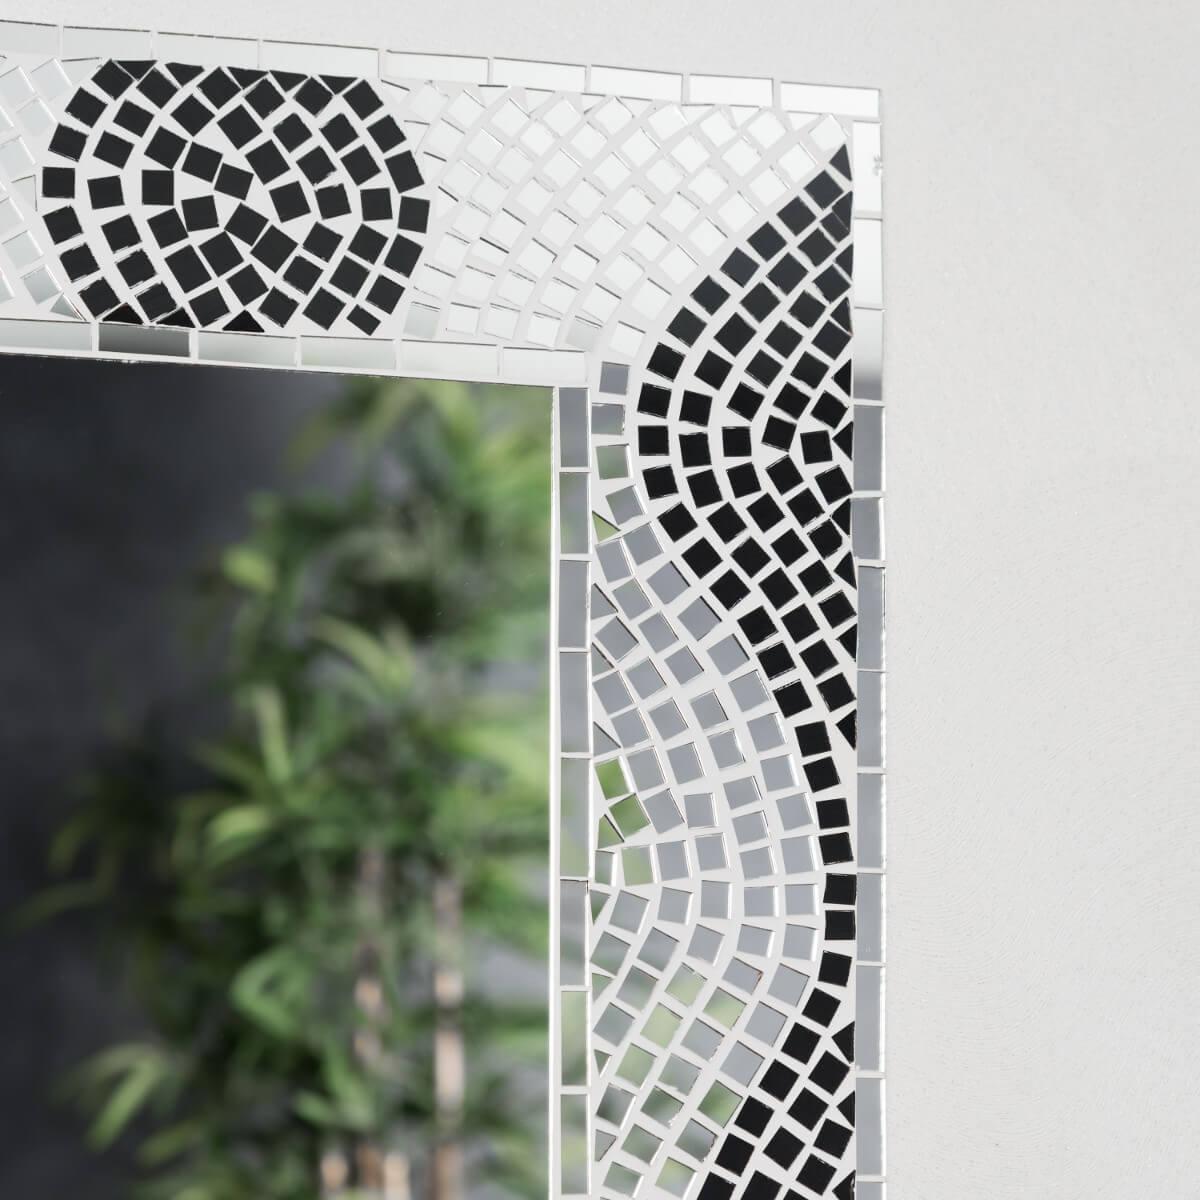 Neuf miroir mosaique design 40cm x 50cm salon chambre ebay for Miroir 50 40